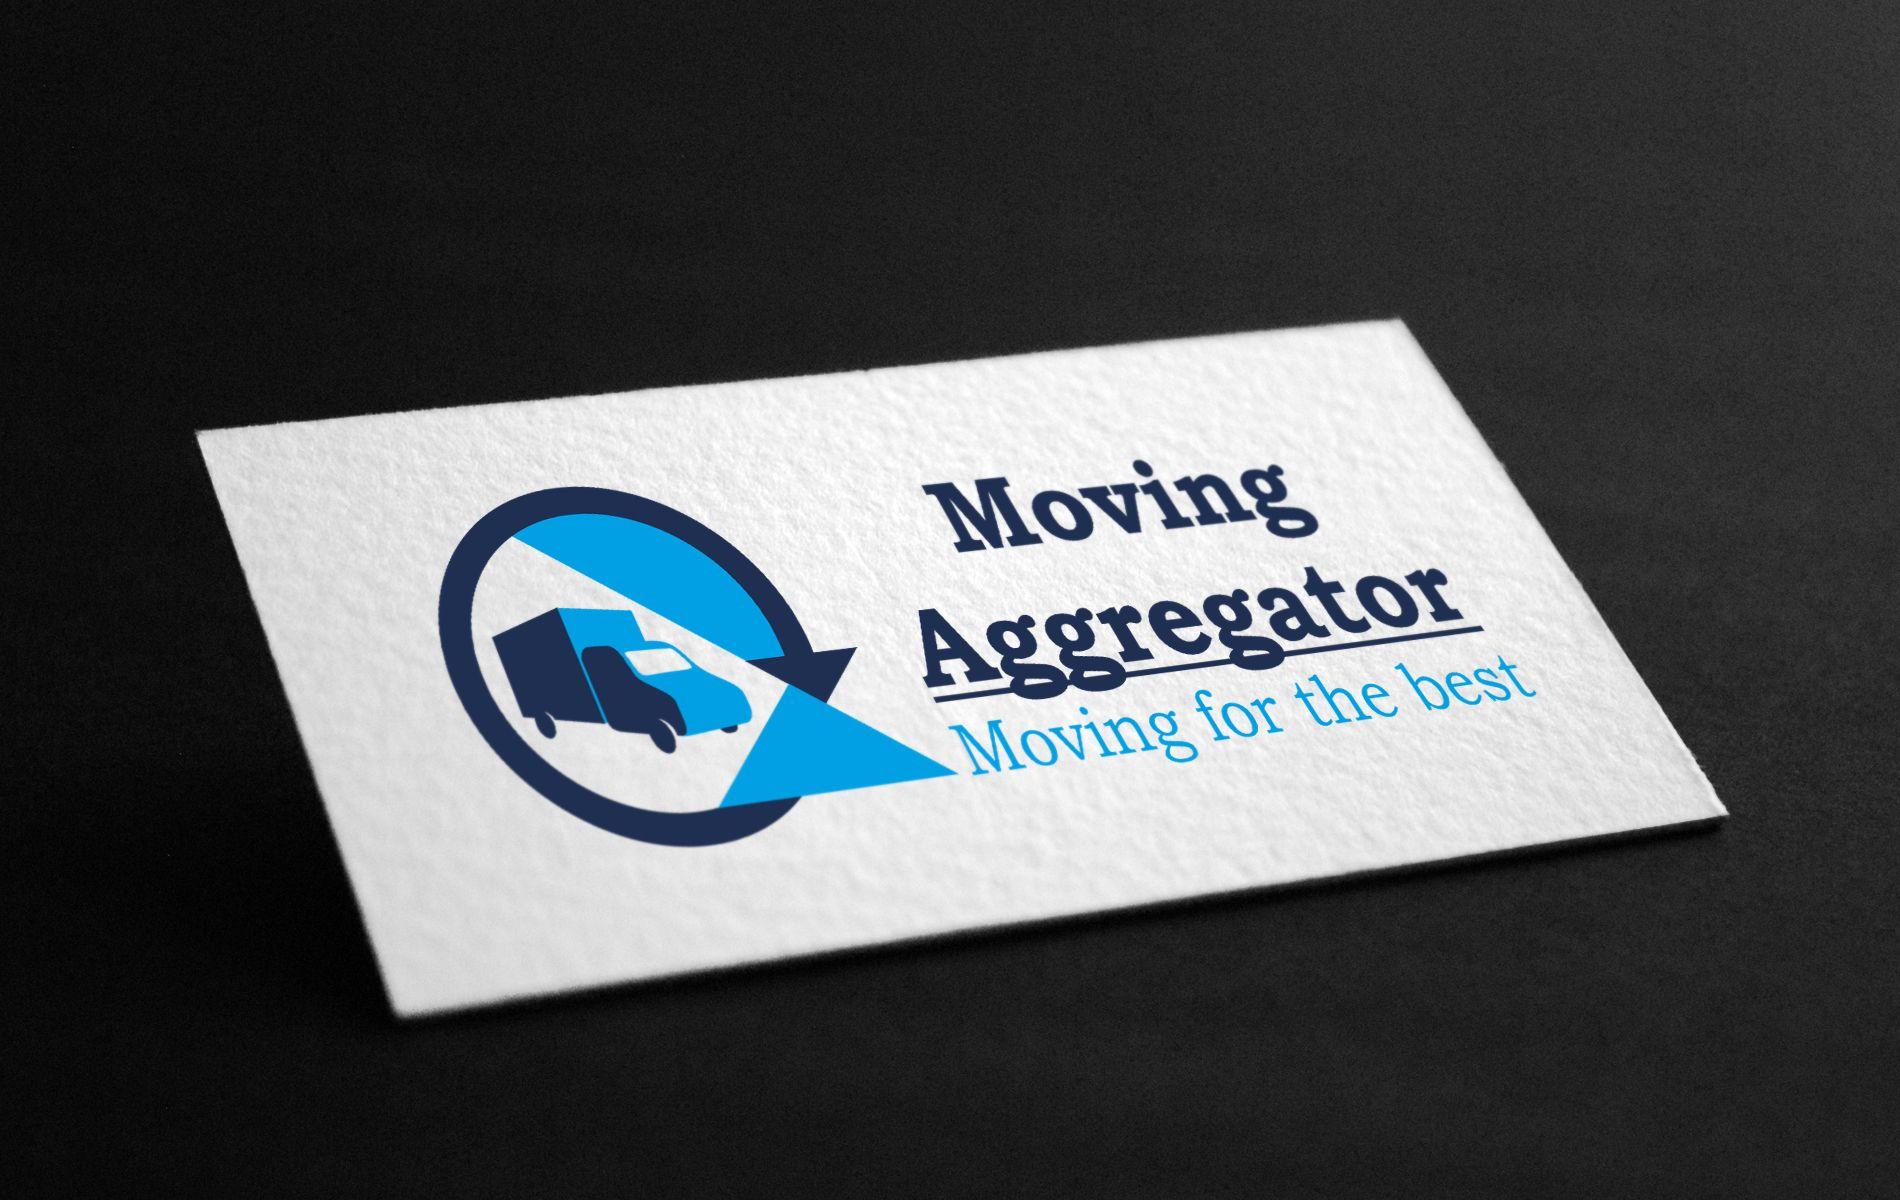 Логотип для компании Агрегатор переездов - дизайнер Anneto4ka074